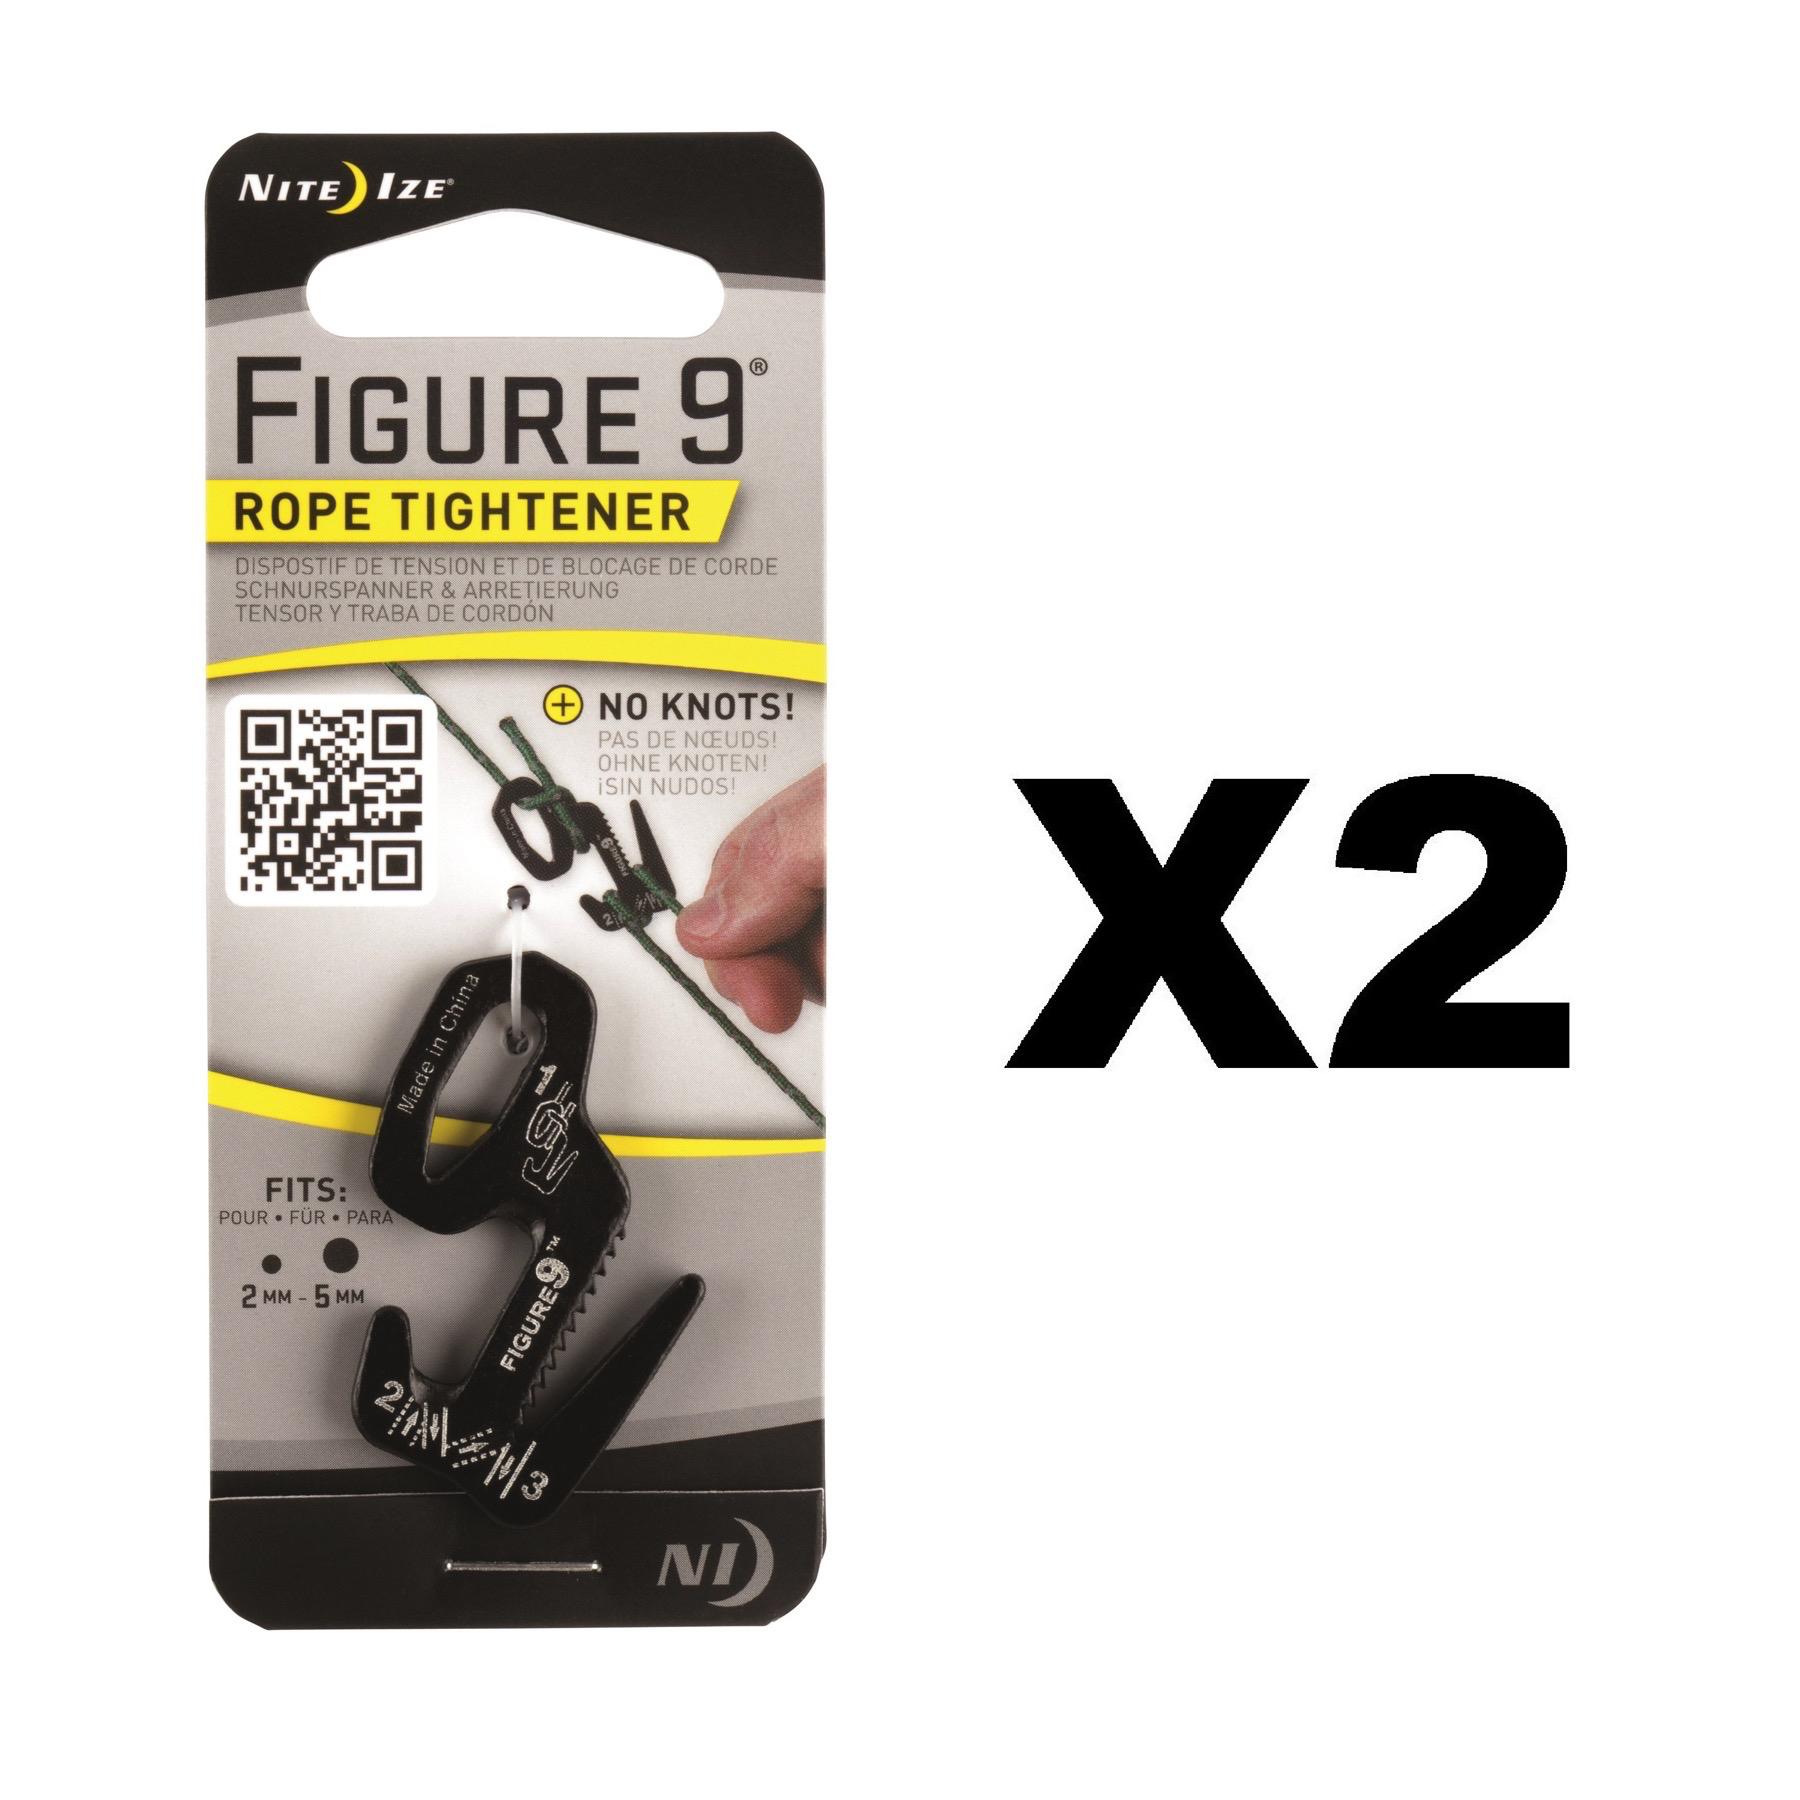 Nite Ize Figure 9 Rope Tightener Small Black Aluminum Tie Down ...